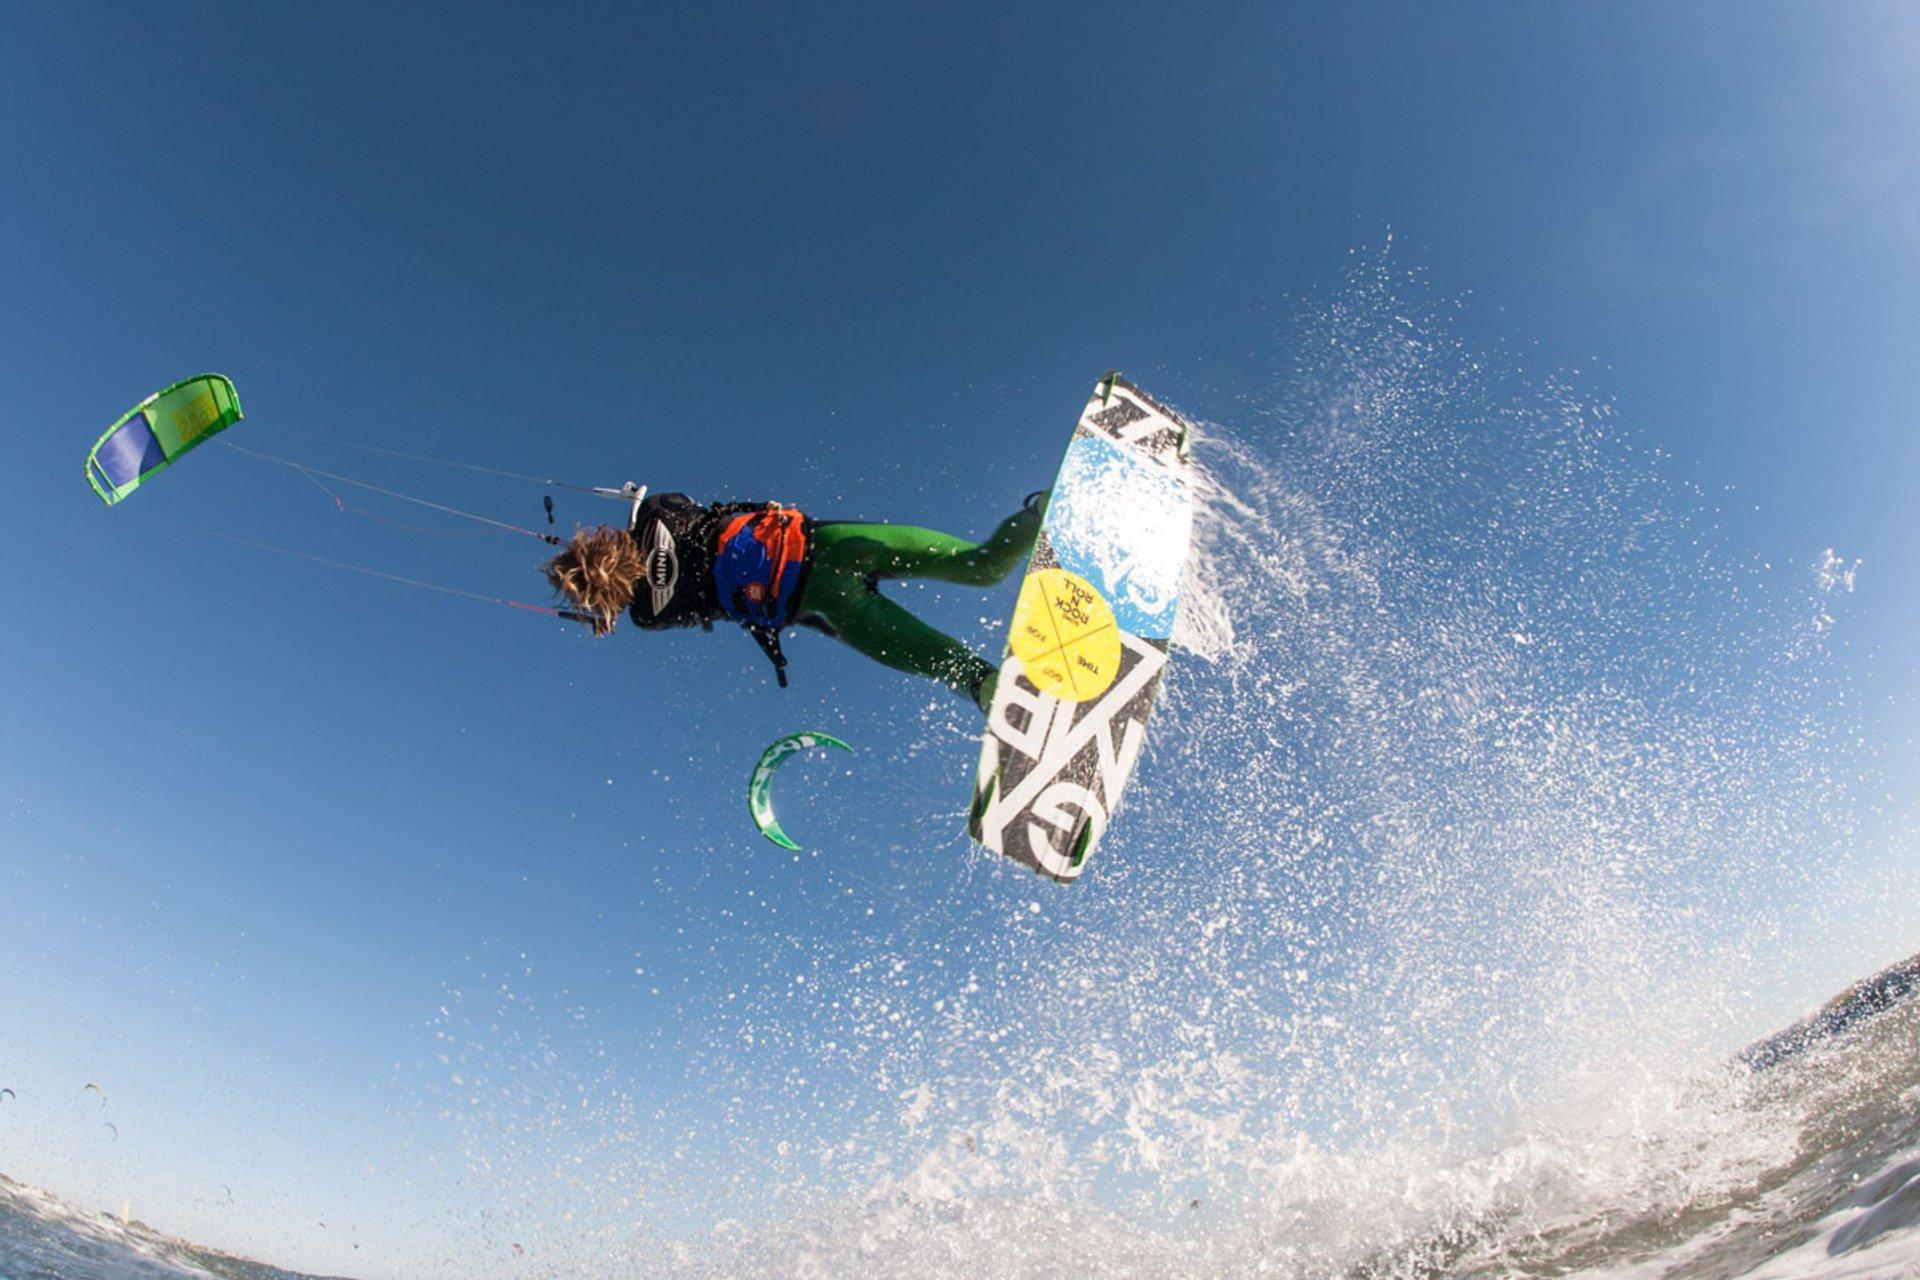 Kitesurfing and Windsurfing  in Barcelona 2020 - Best Time